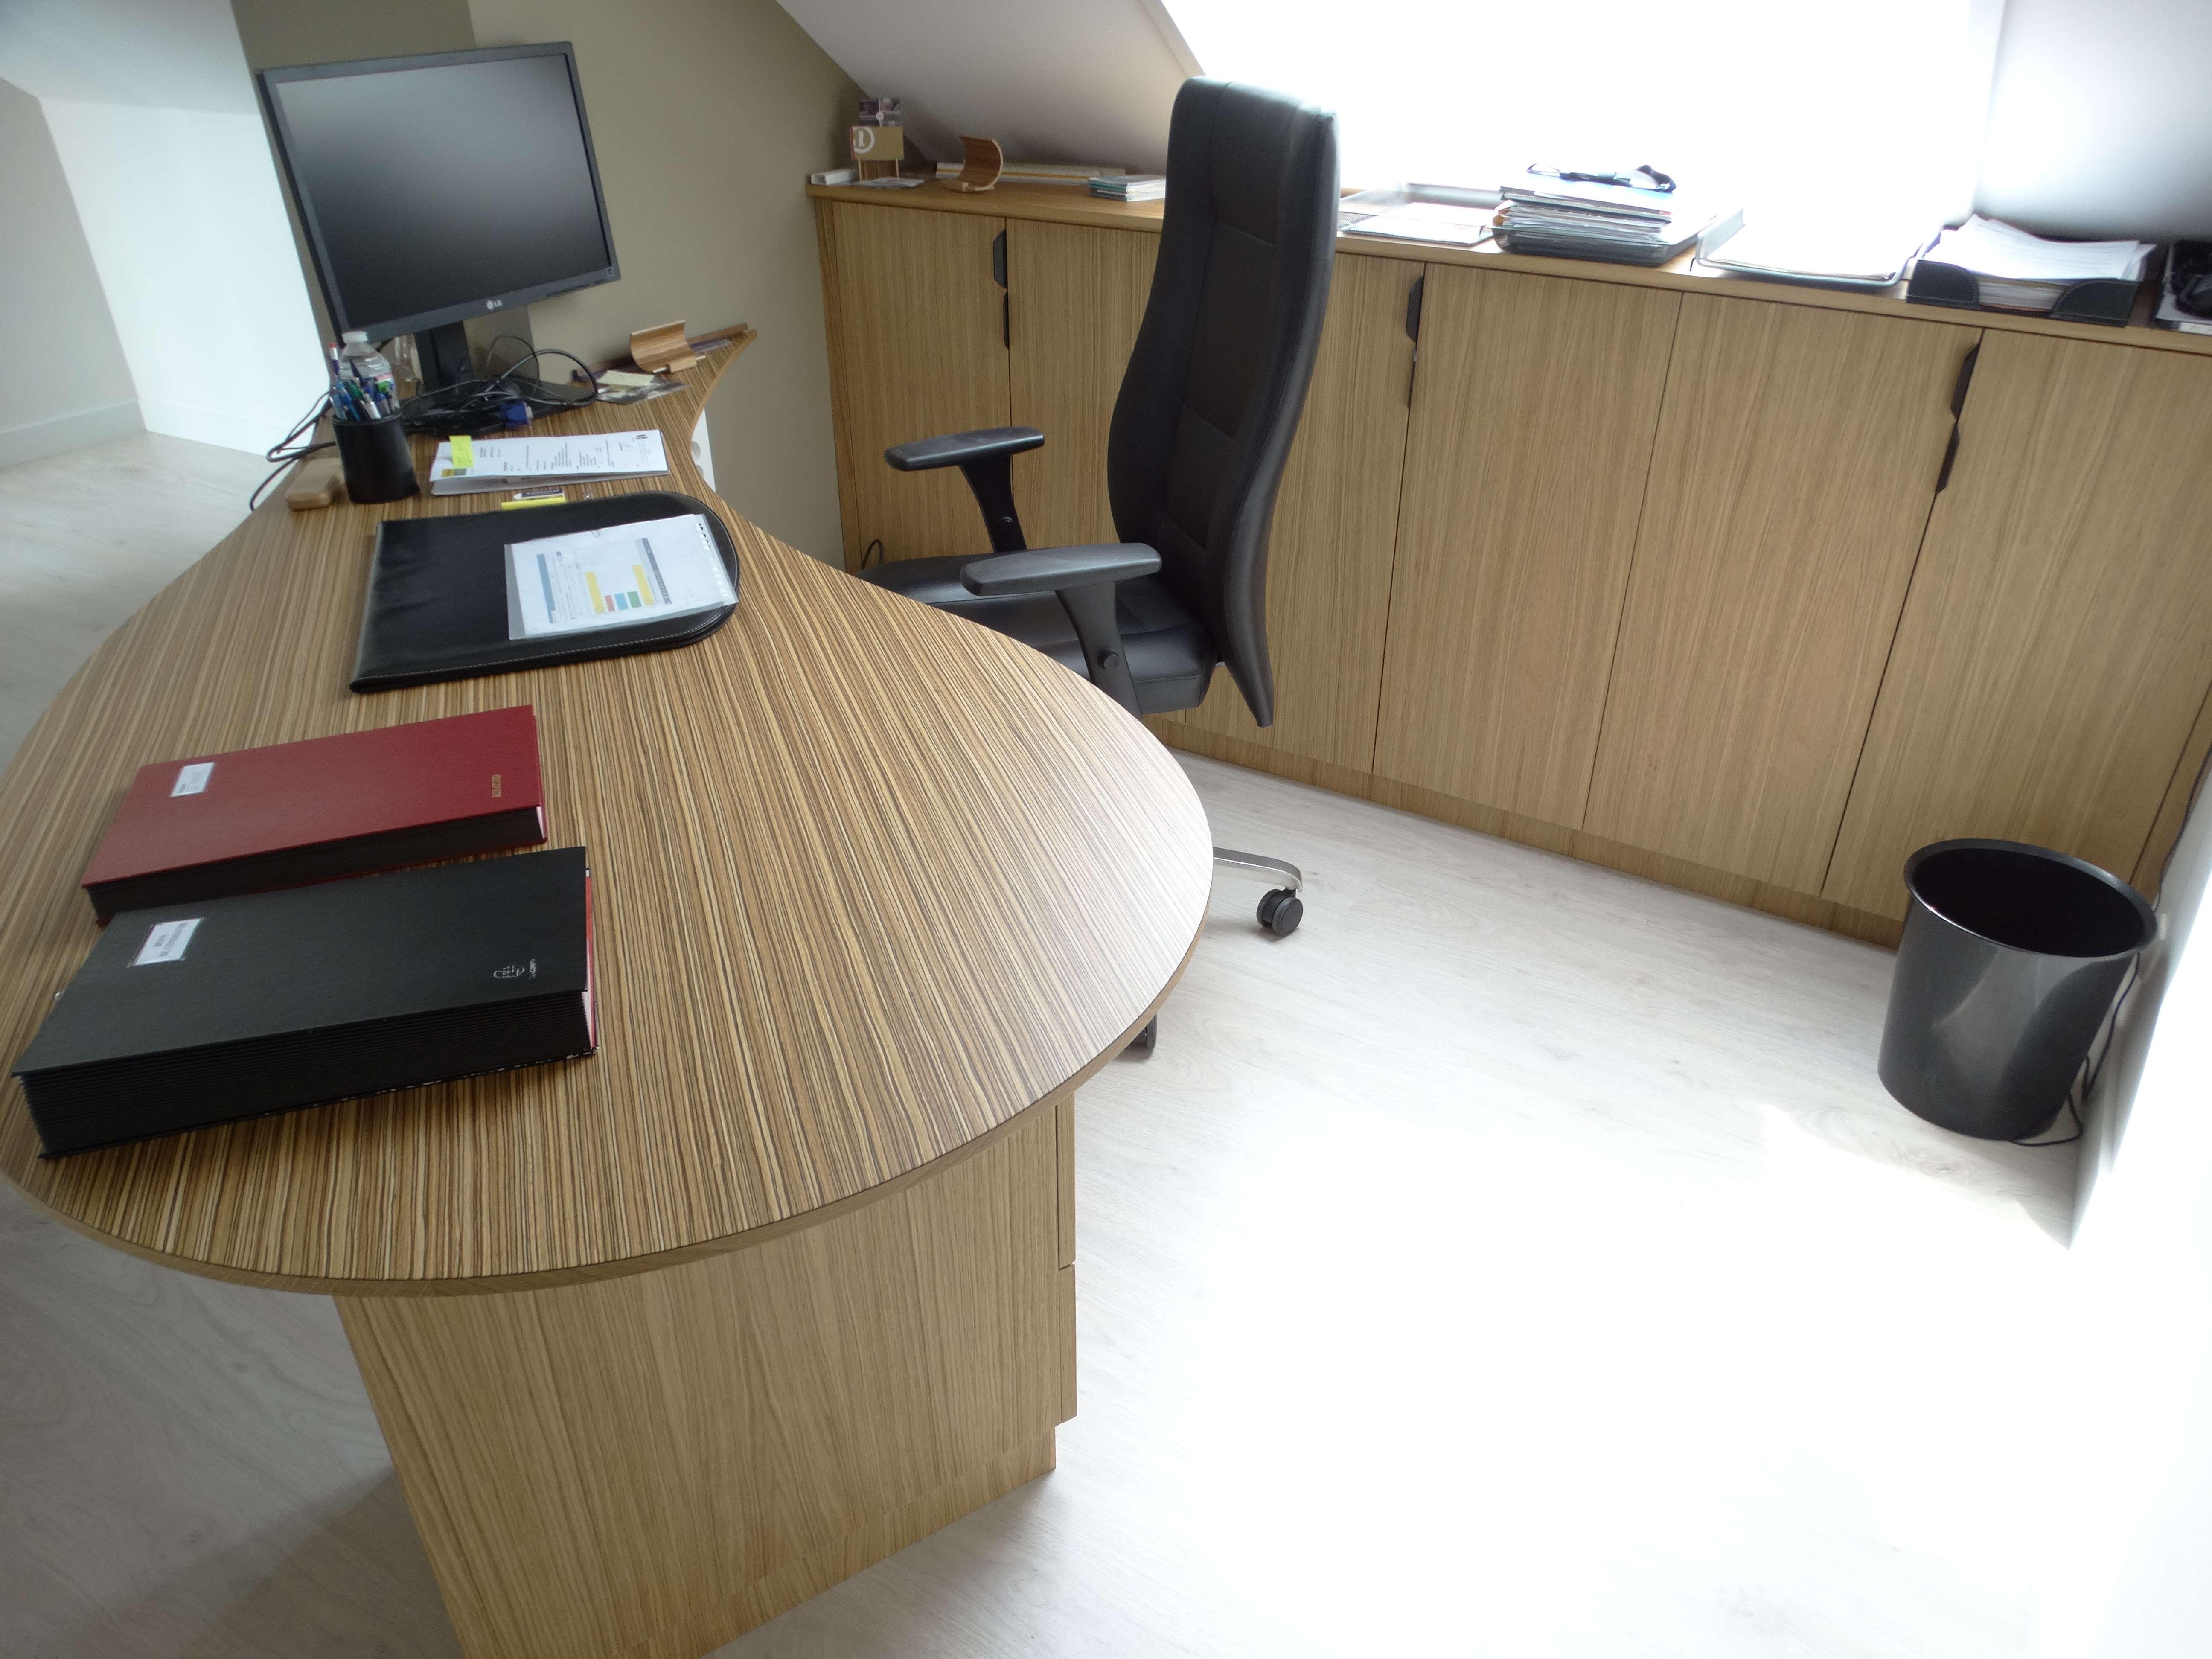 Bureau sur mesure maire original chene zebrano - Bureau original mairie en bois zebrano et chêne